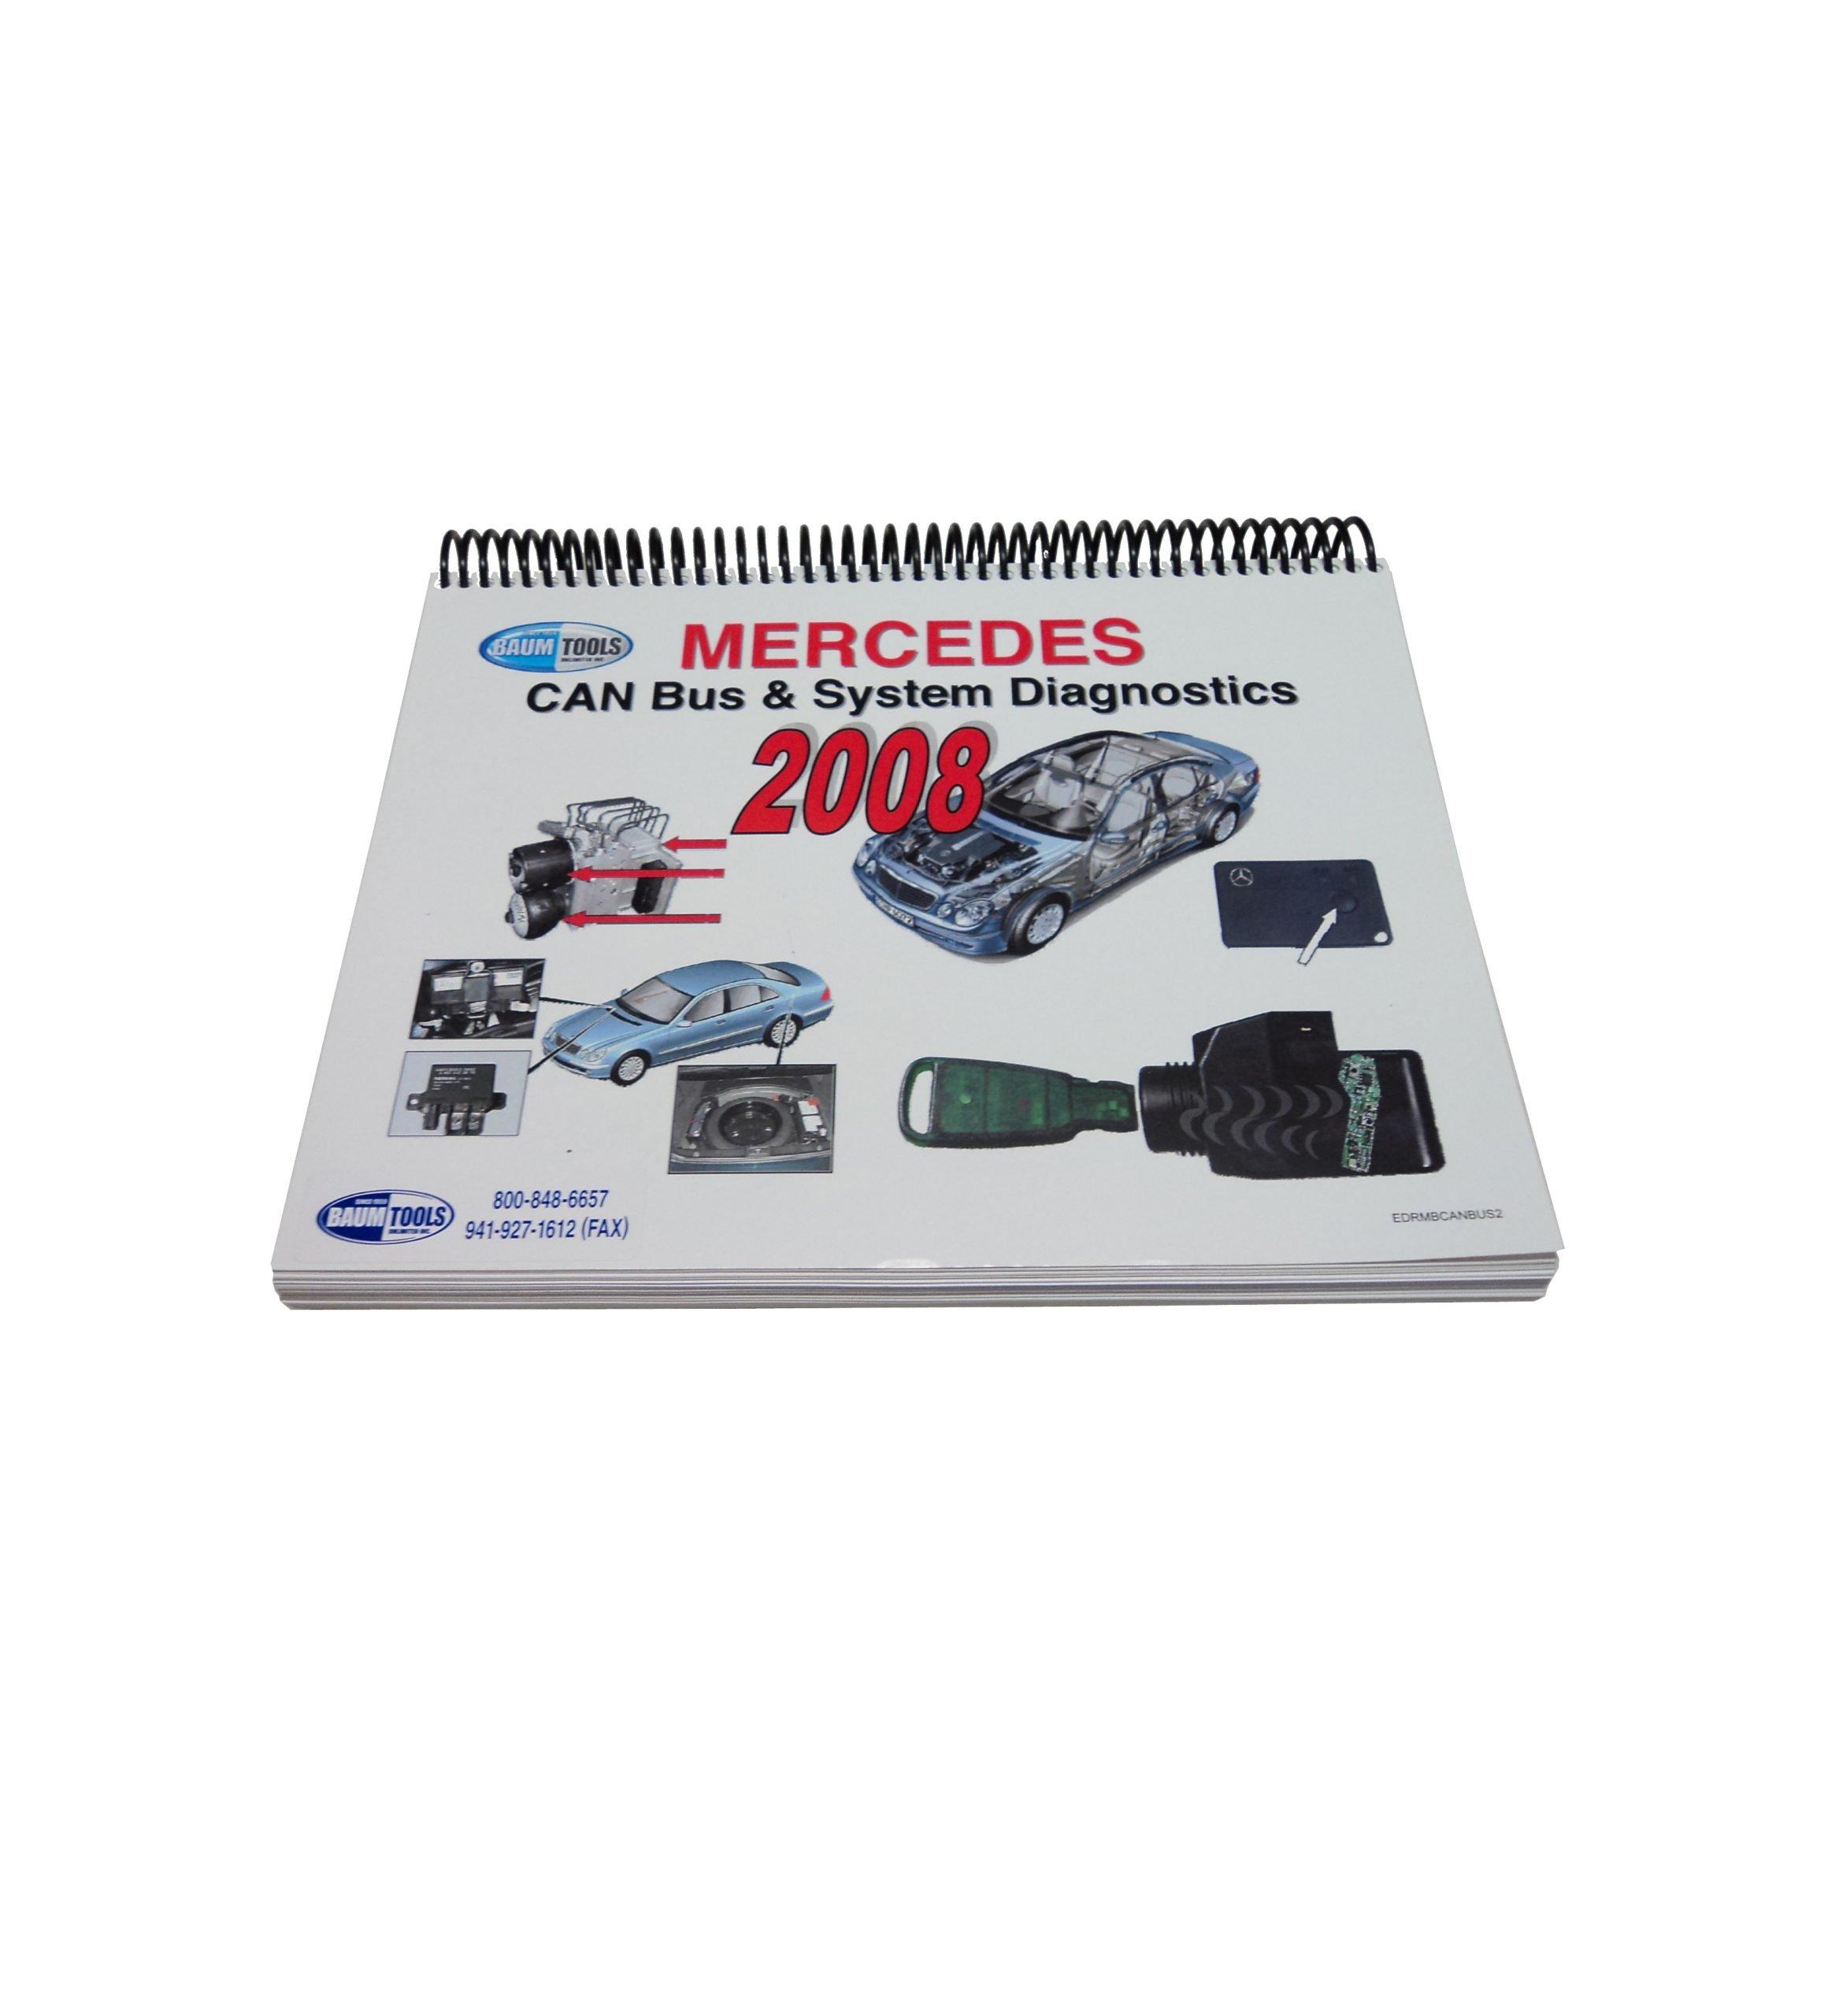 Mercedes CAN Bus & System Diagnostics Volume Two